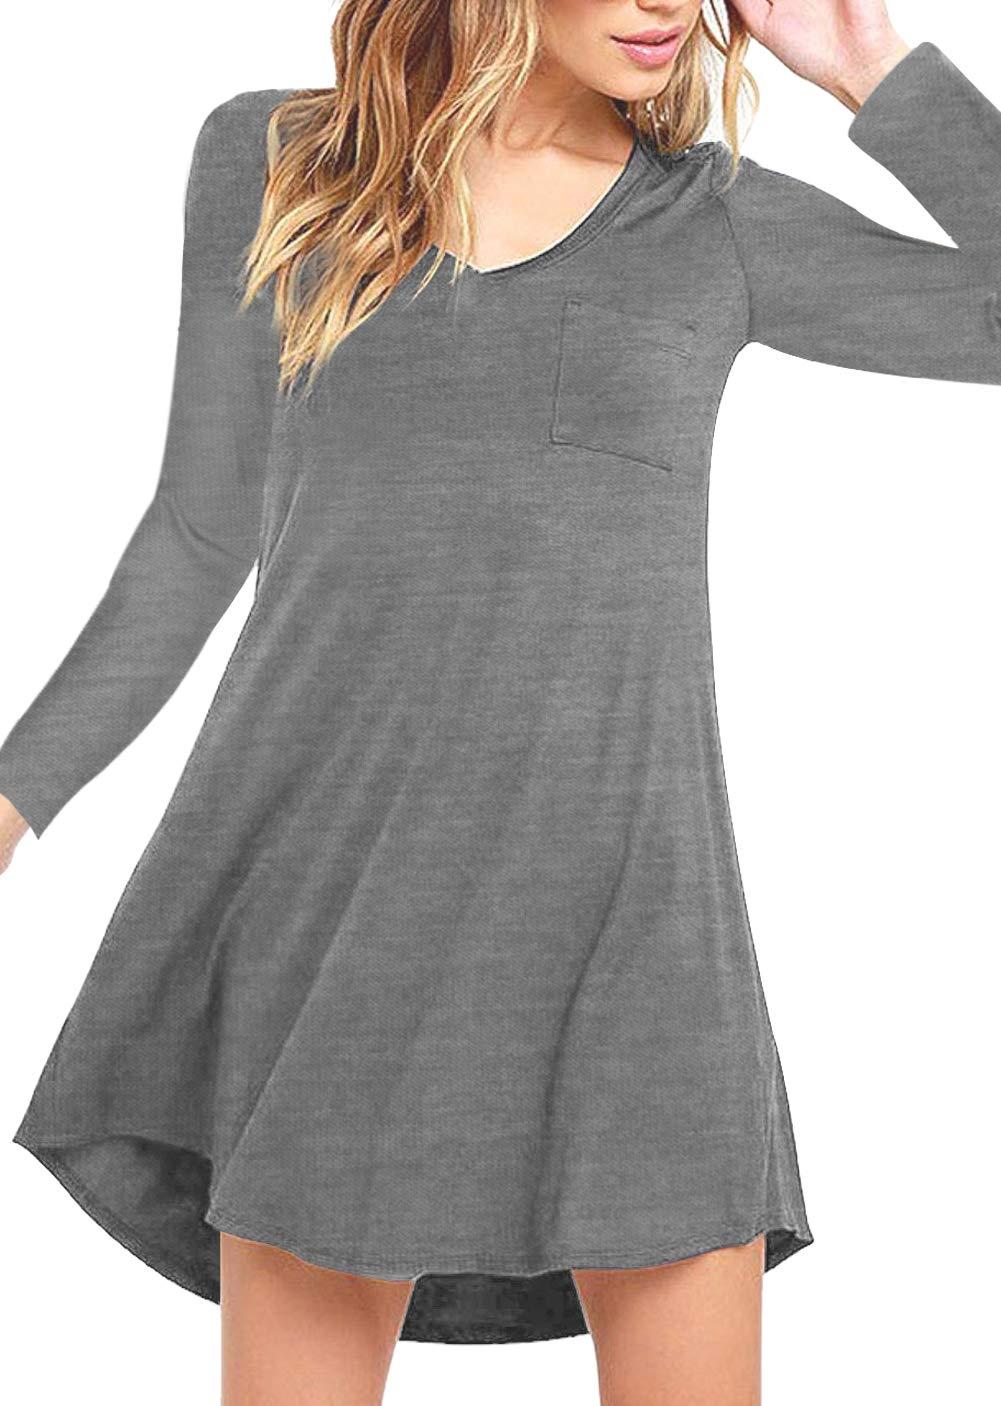 Eanklosco Womens Casual Short Sleeve Plain Pocket V Neck T Shirt Tunic Dress (Grey-1, M)